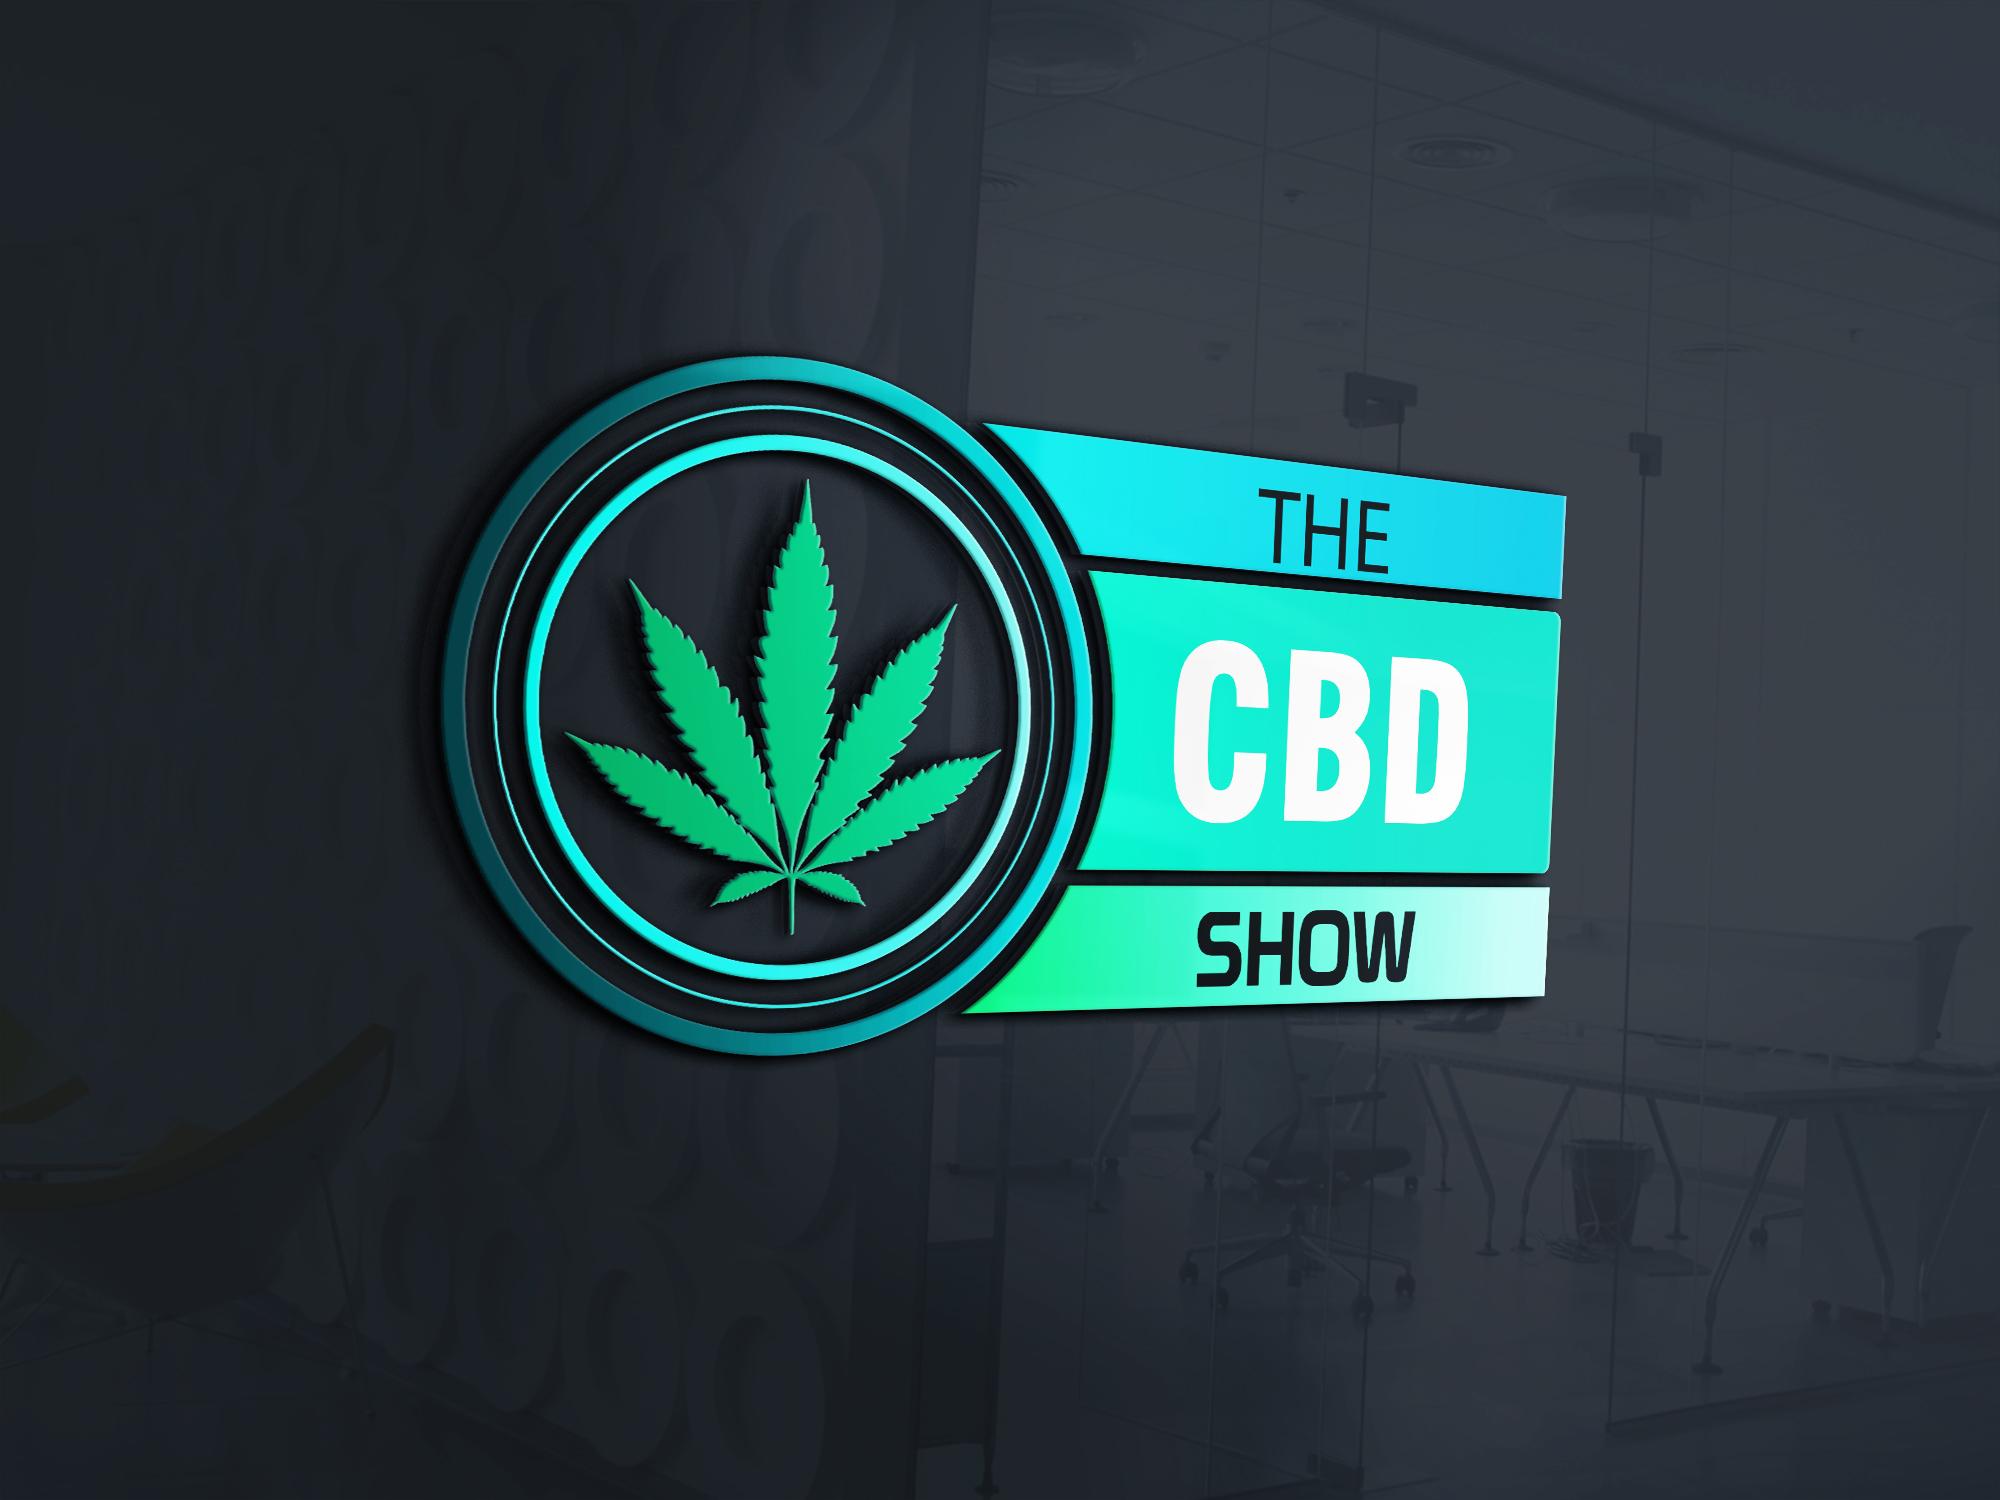 The CBD Show Expo